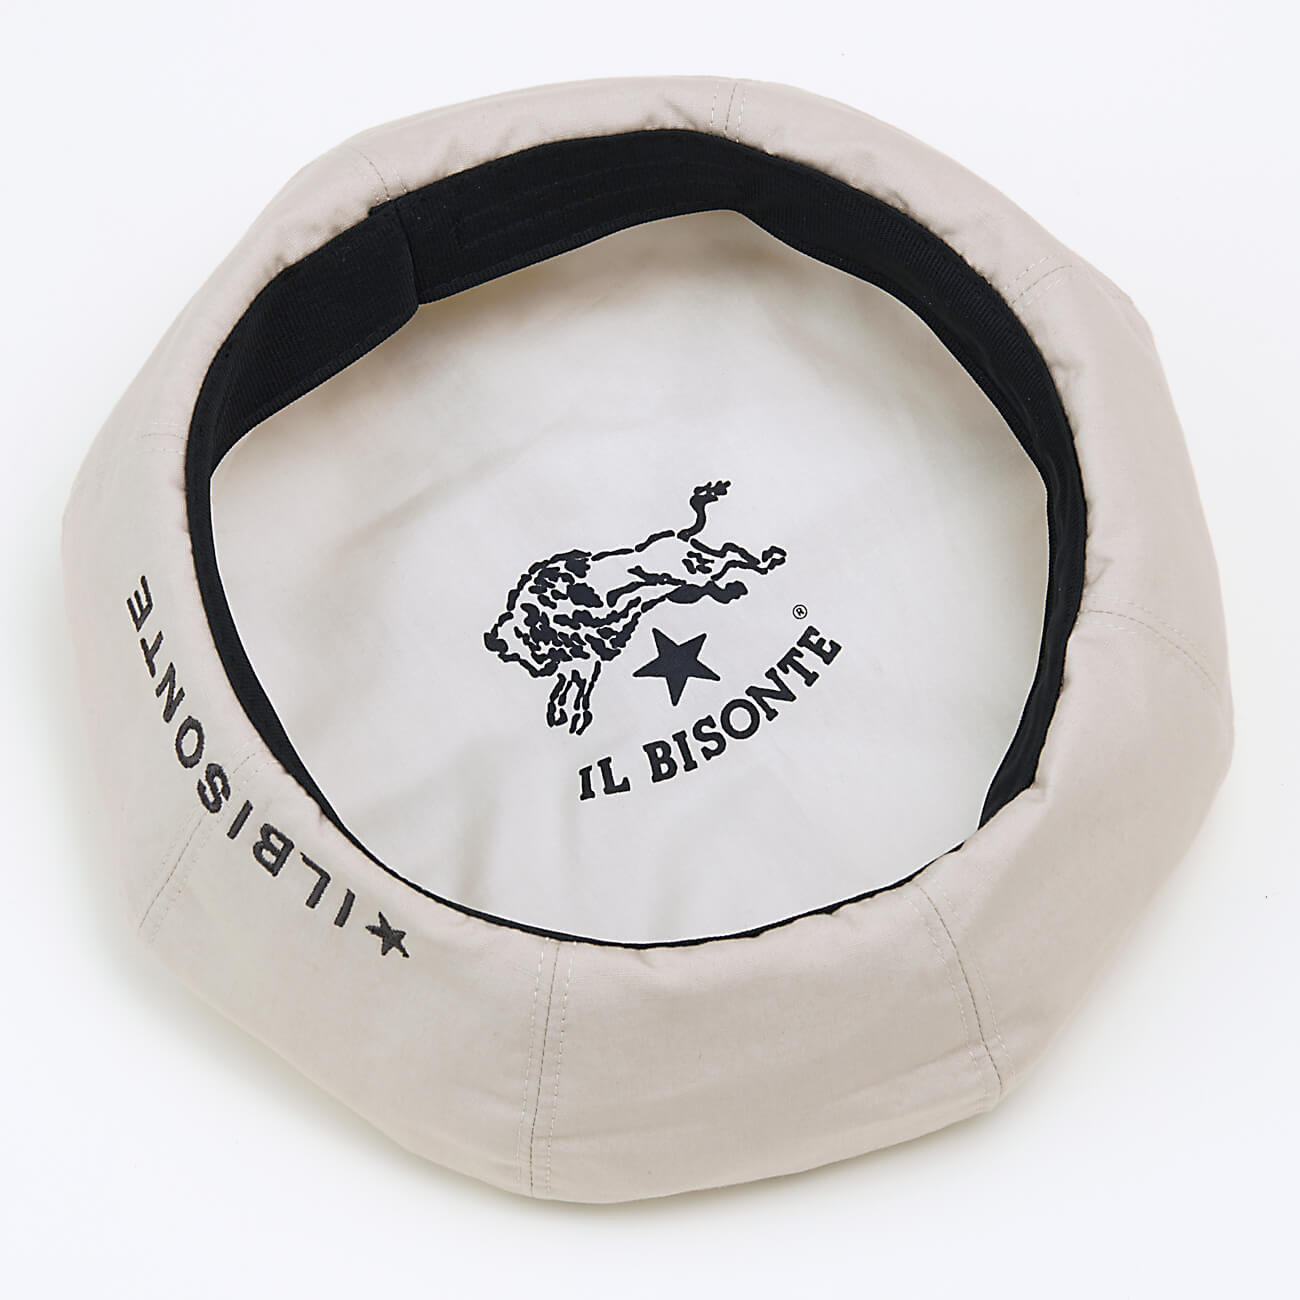 IL BISONTE (イル ビゾンテ) 日本公式オンラインストア ベレー帽 54202304383